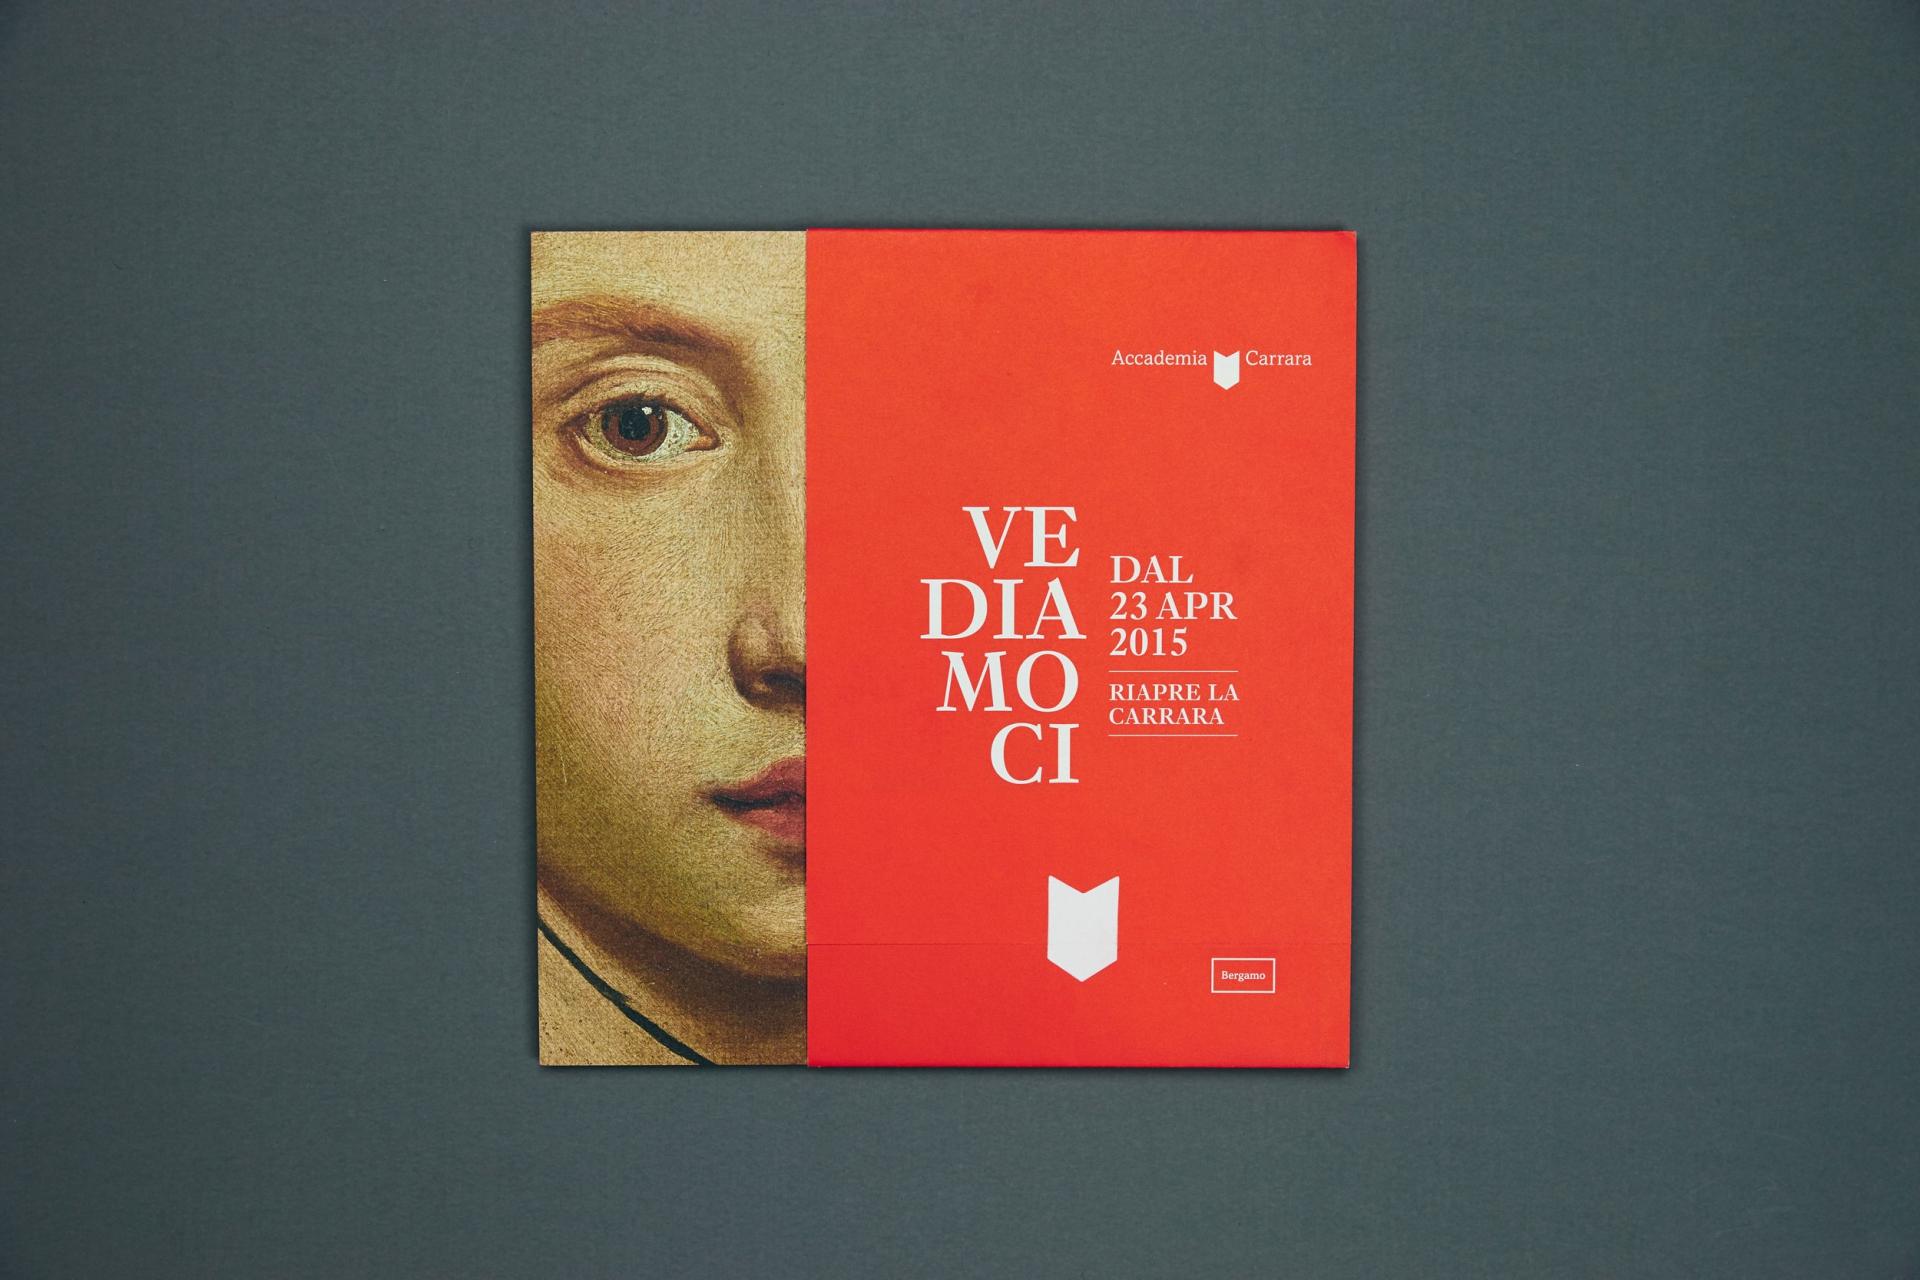 Claudia Polizzi Studio L&B, Accademia Carrara, 2014-2016